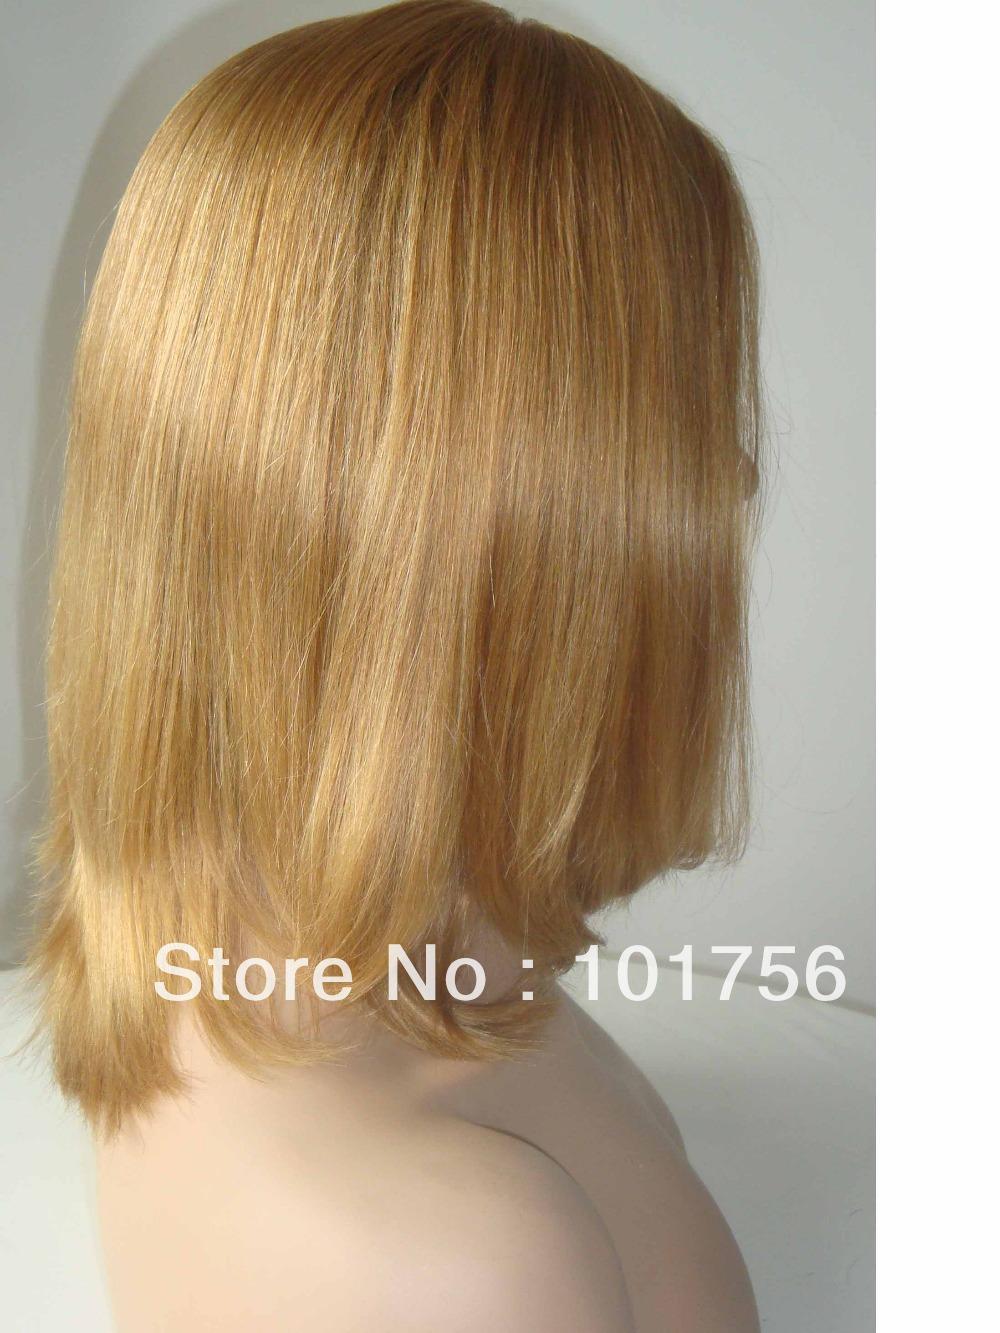 New Arrival 100% Virgin Blonde Color European Hair Jewish Wig(China (Mainland))